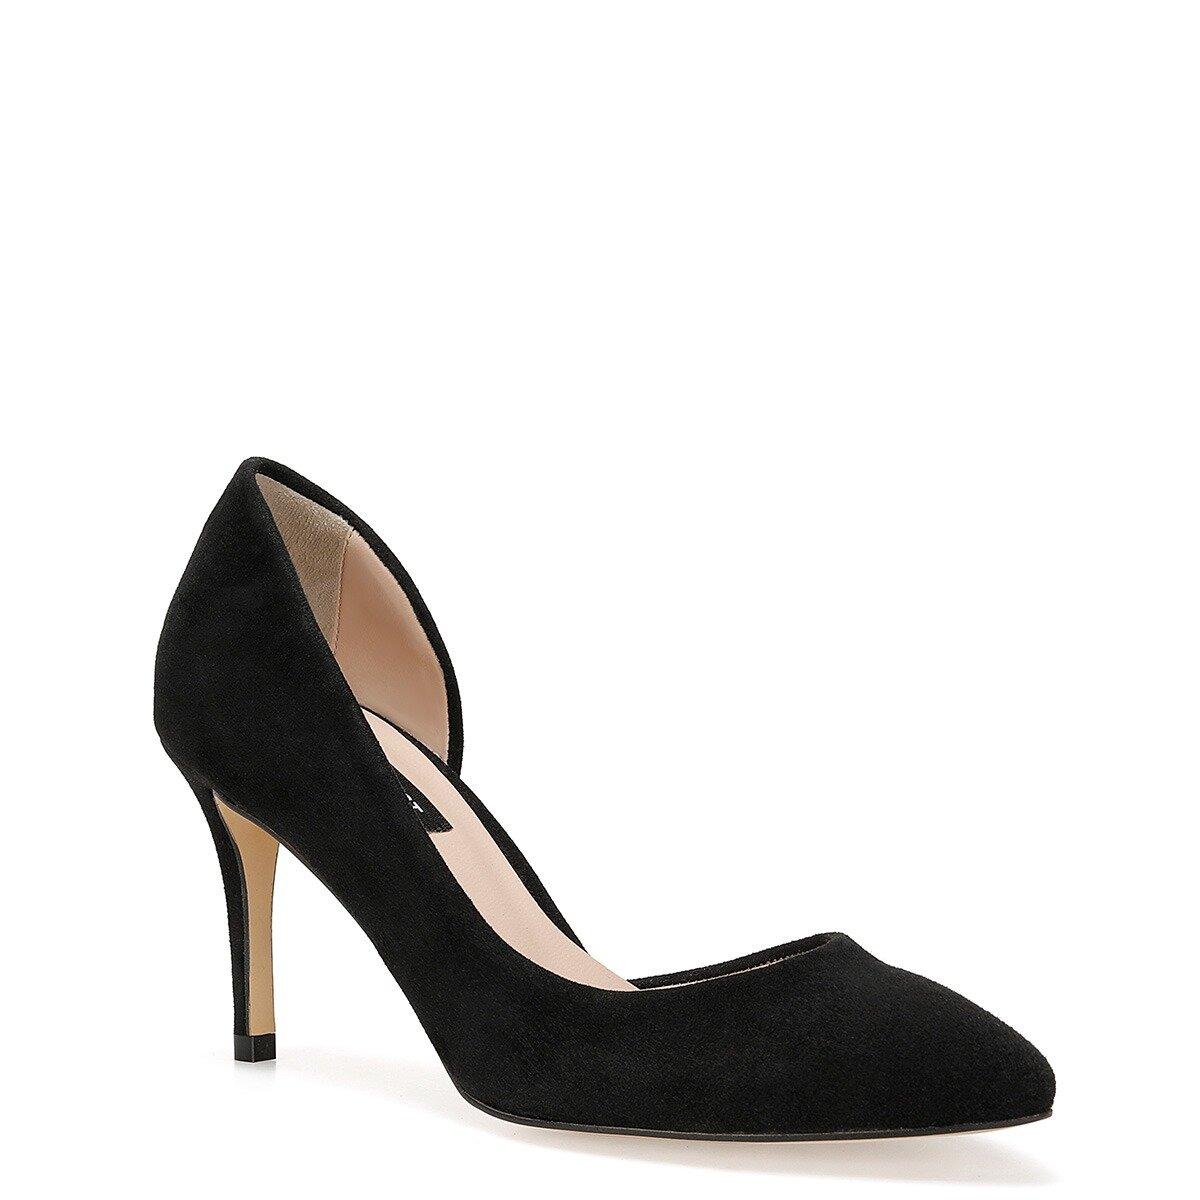 TIKKA Siyah Kadın Topuklu Ayakkabı